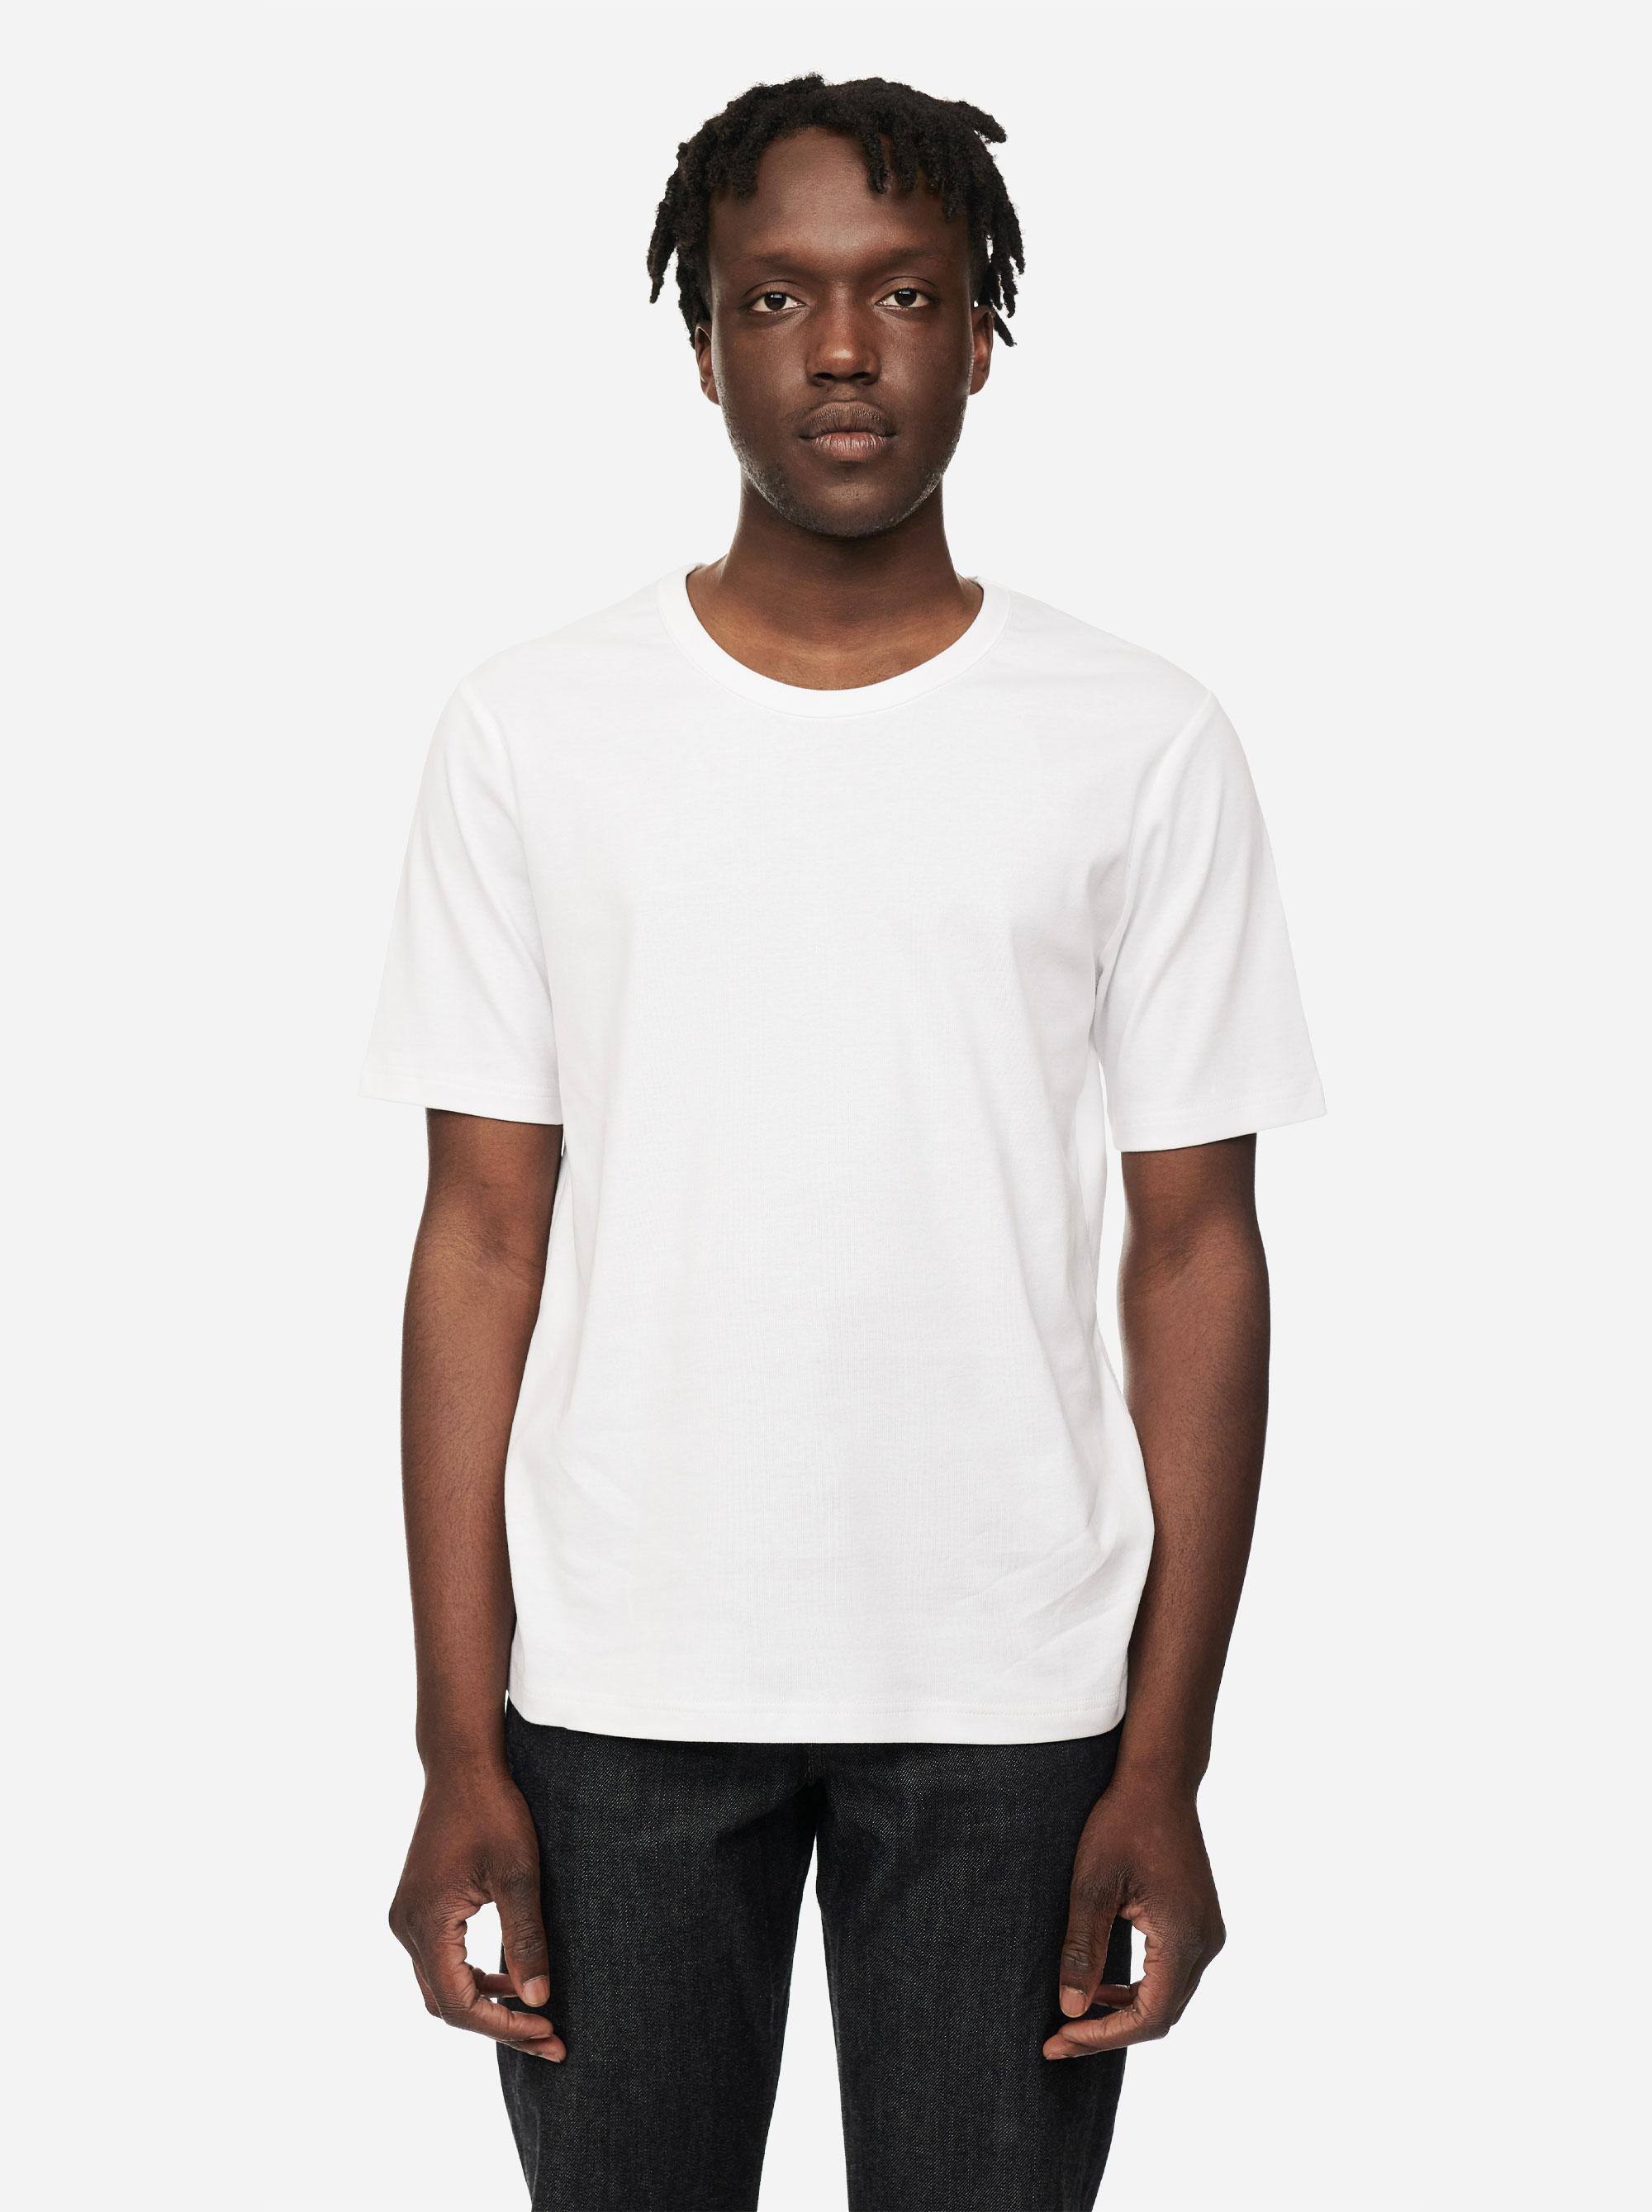 Teym - The T-Shirt - Men - White - 3